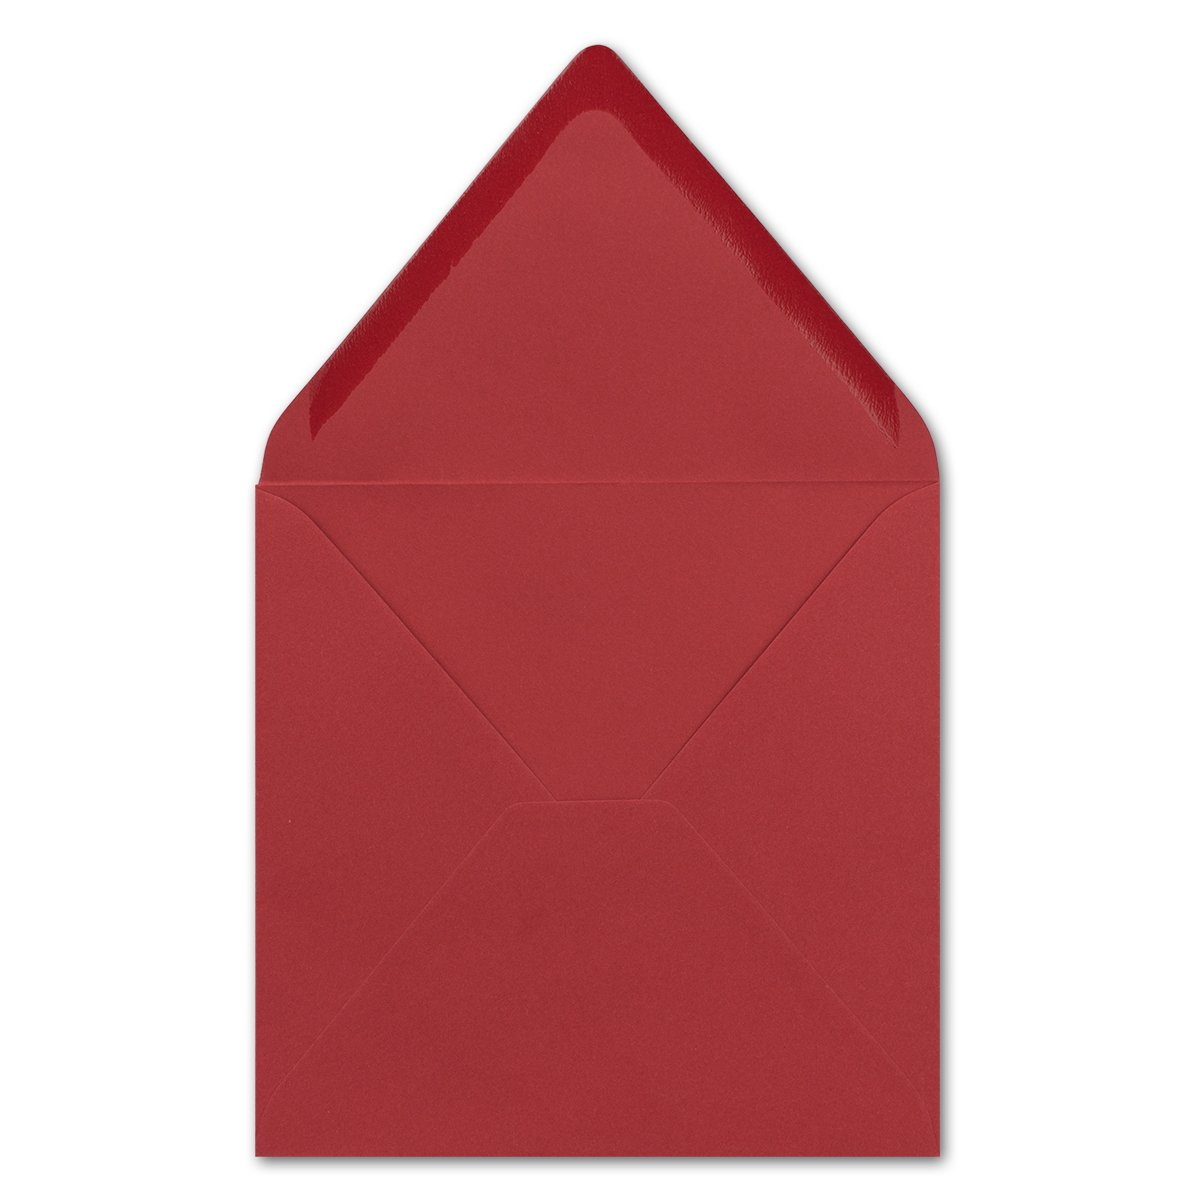 Buste per lettere Quadrate pesante qualit/à/ bagnato a punta////Dalla serie farbenfroh 25 Umschl/äge Dunkelrot mit Struktur 140/X 140/mm /90/G//M/² /molto stabile/